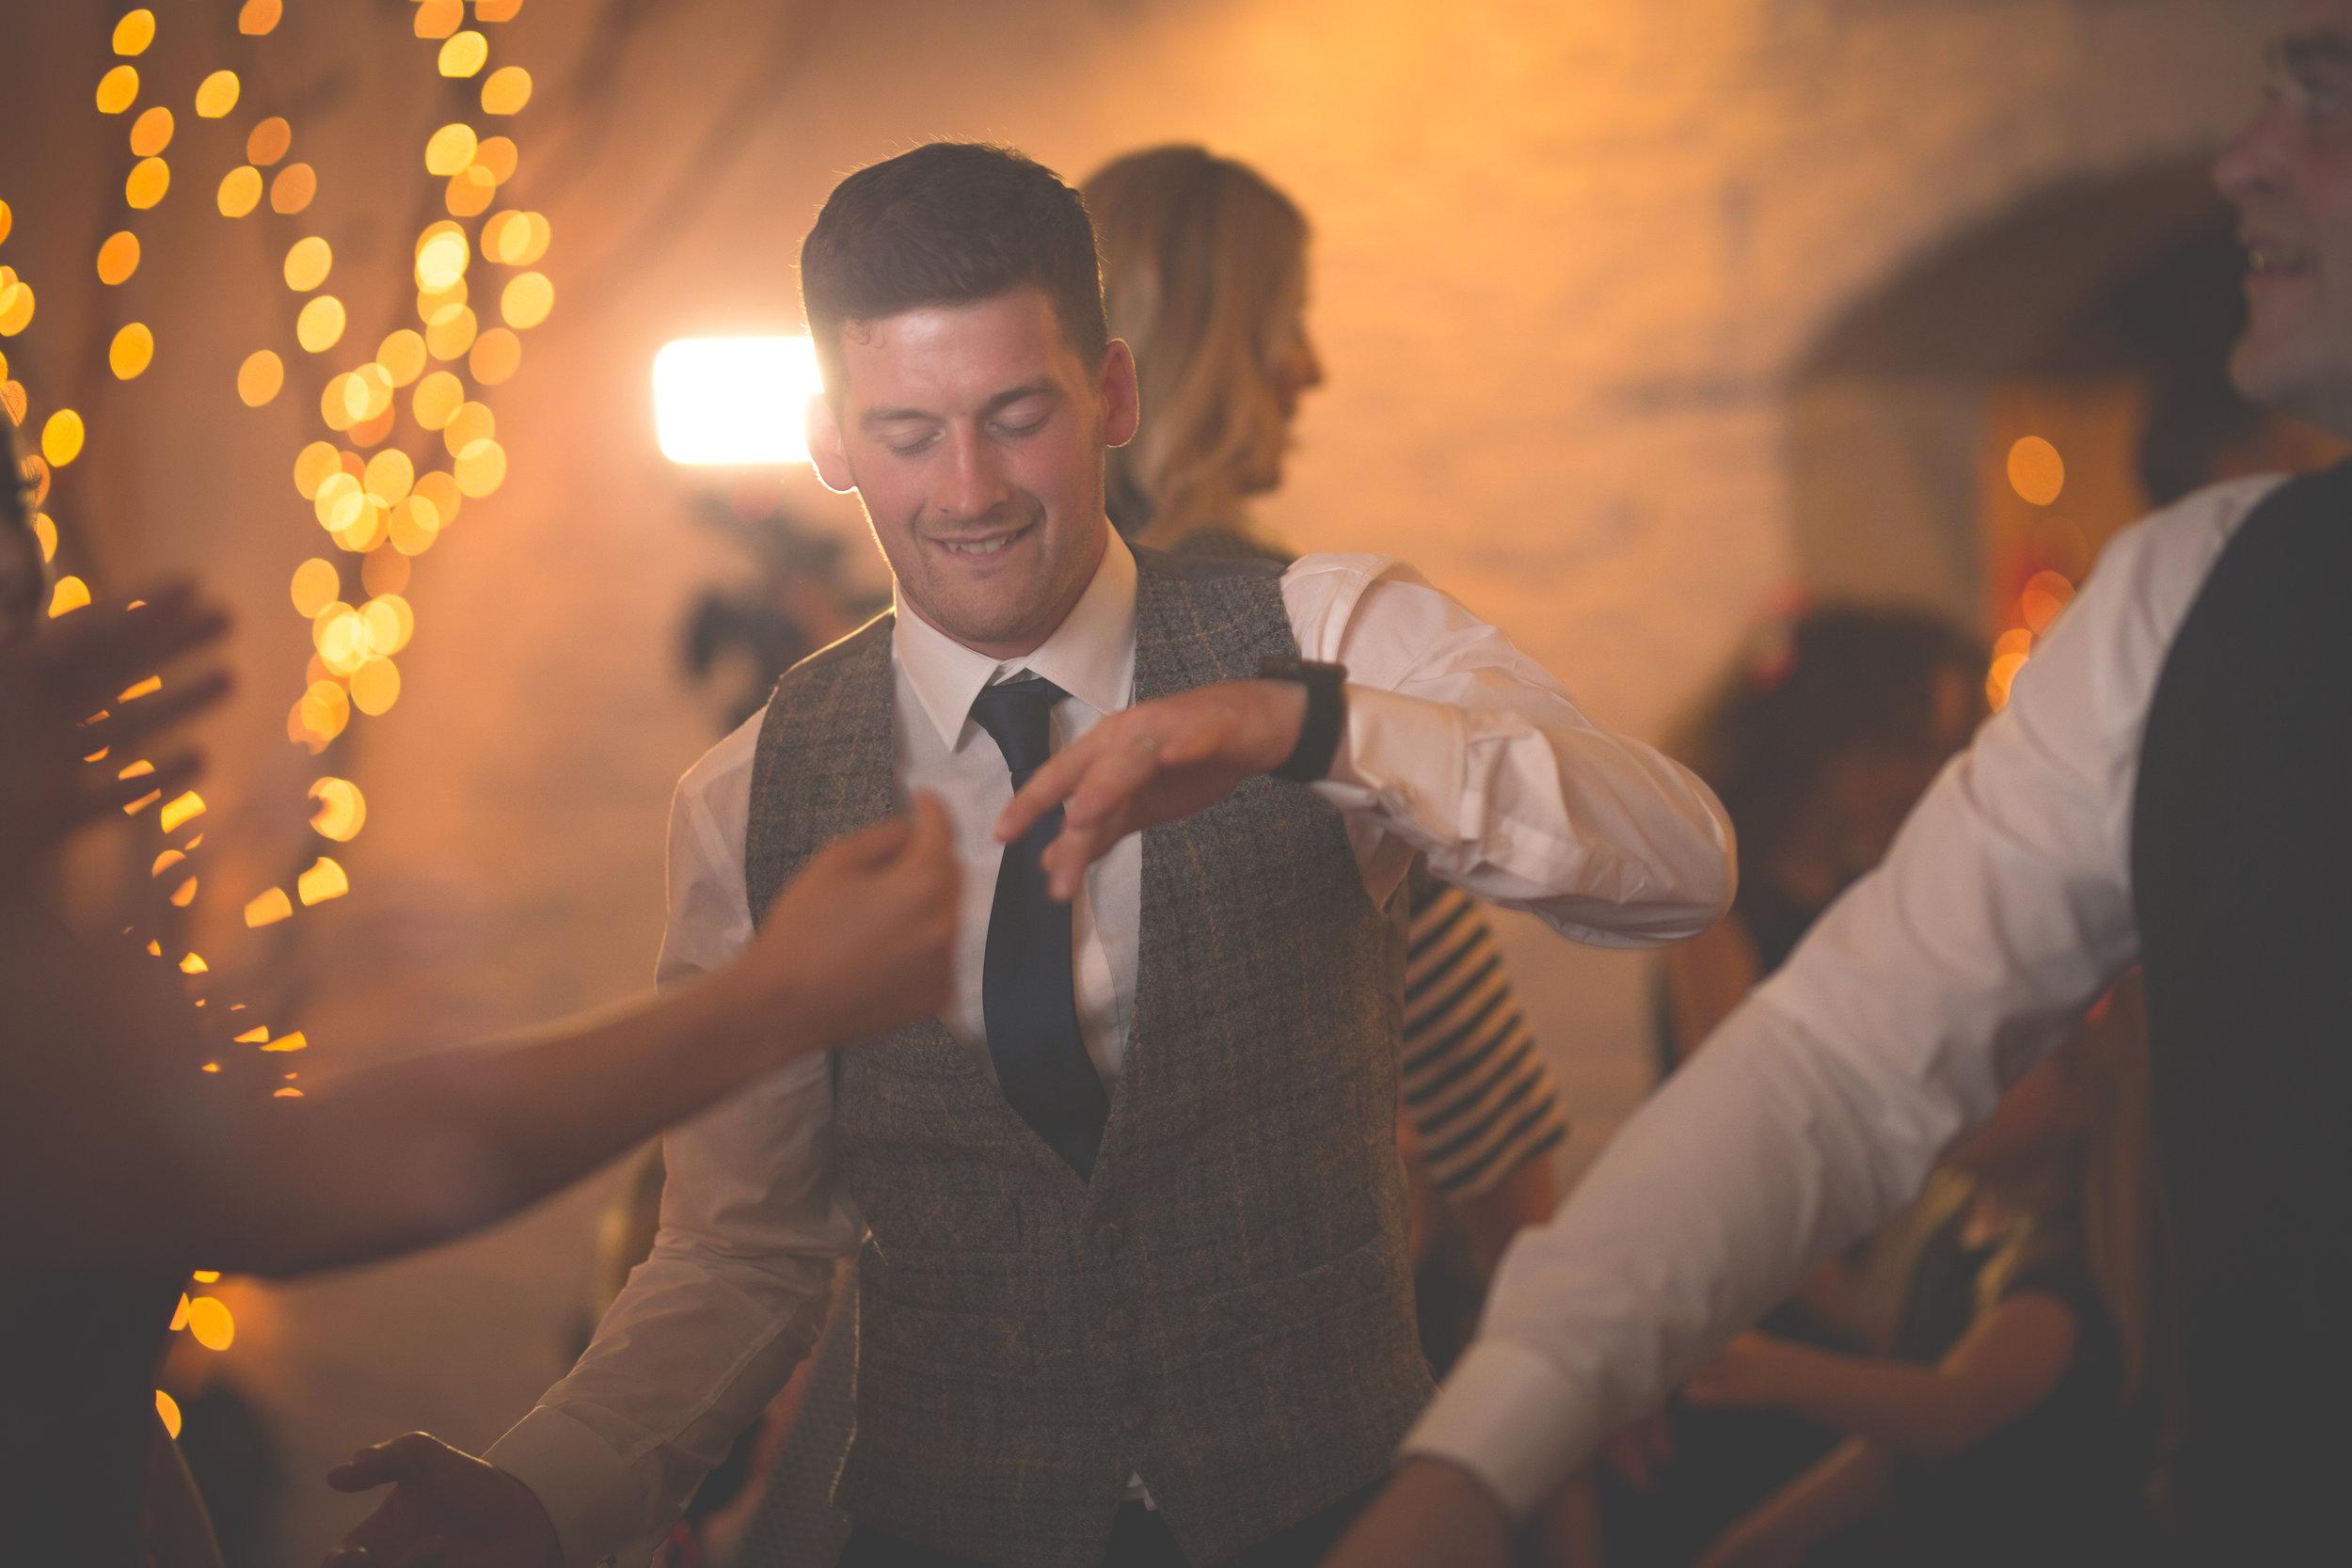 Brian McEwan Wedding Photography | Carol-Annee & Sean | The Dancing-66.jpg